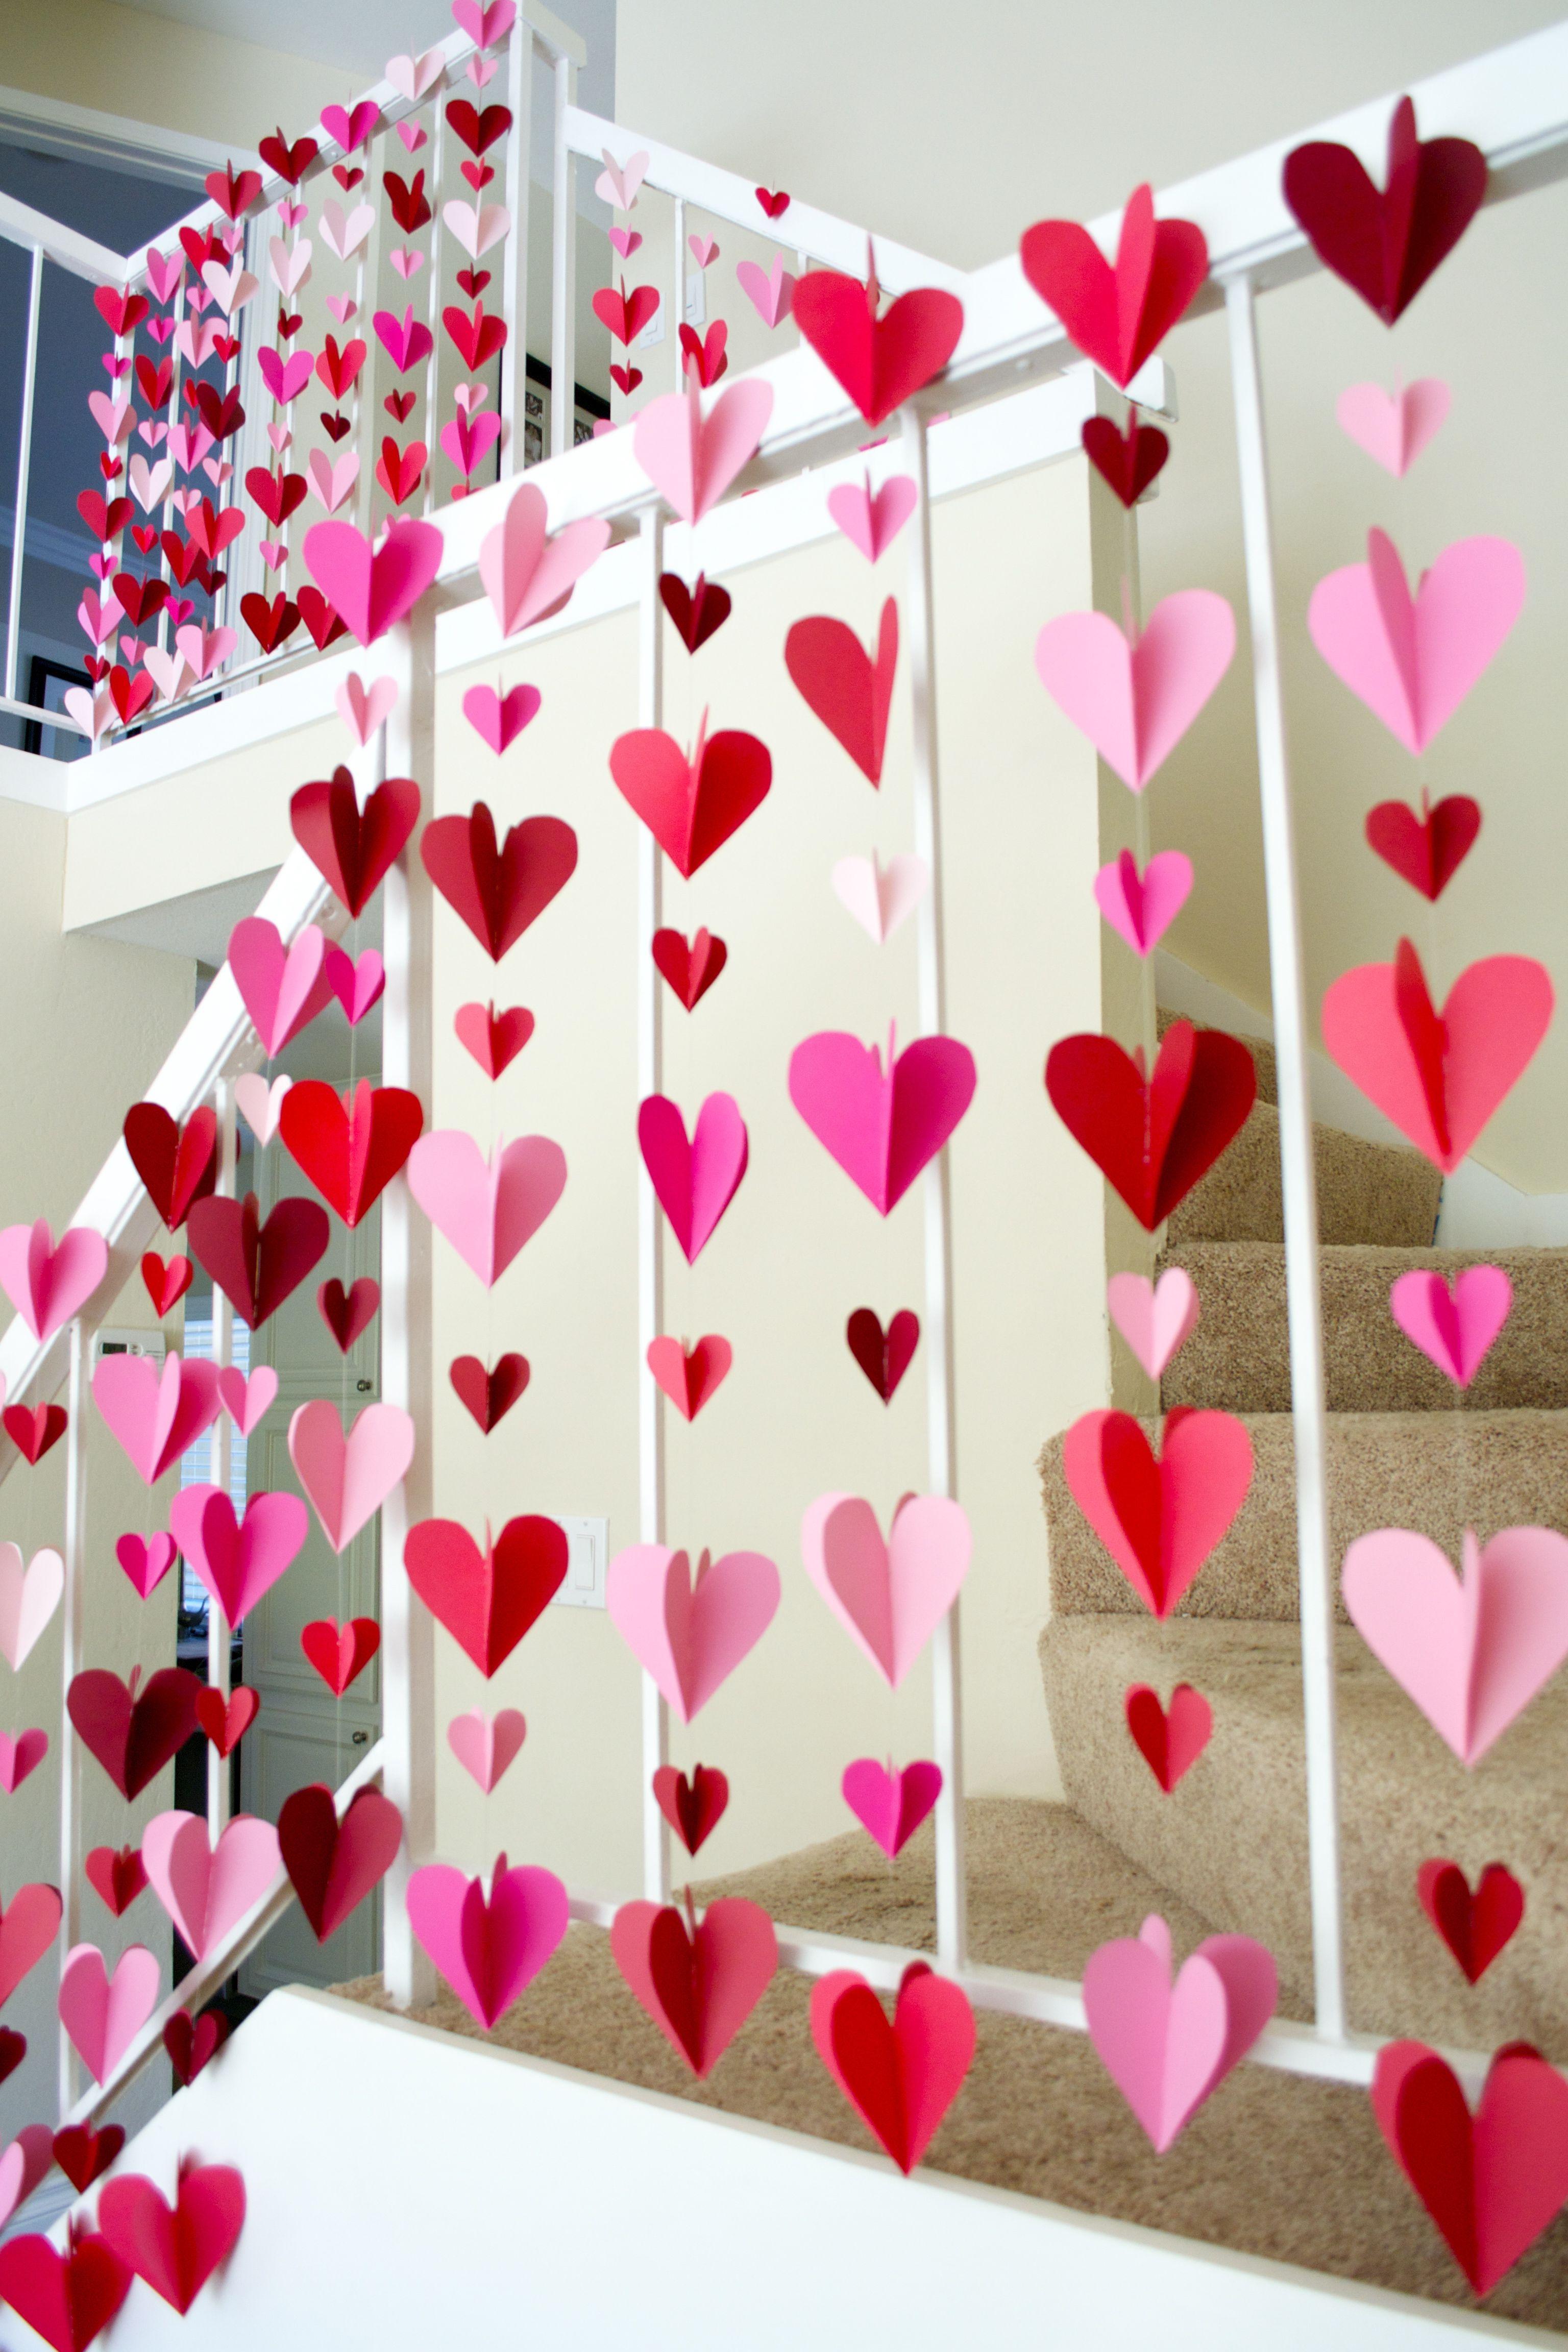 3 D Heart Paper Garlands Easy Diy Valentine Decorations Diy